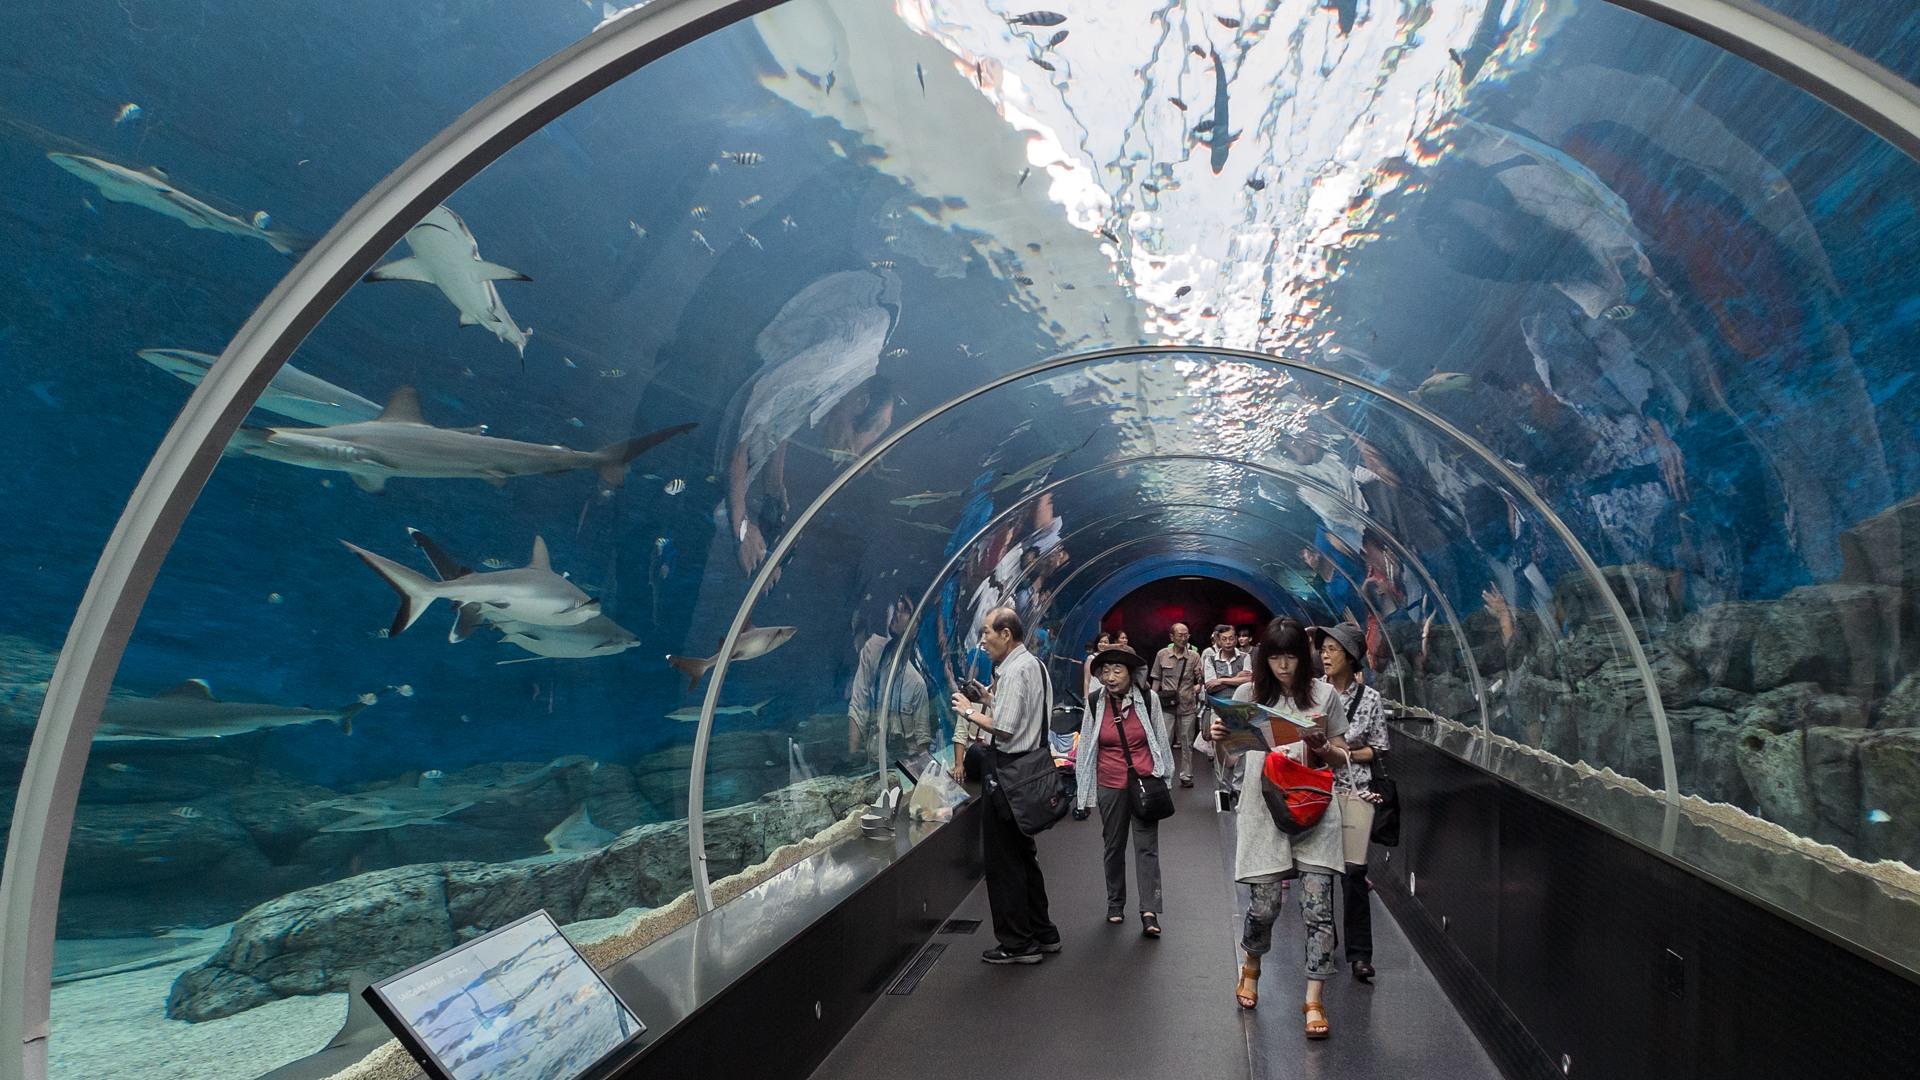 Ареал акул (Shark seas), S.E.A. Aquarium